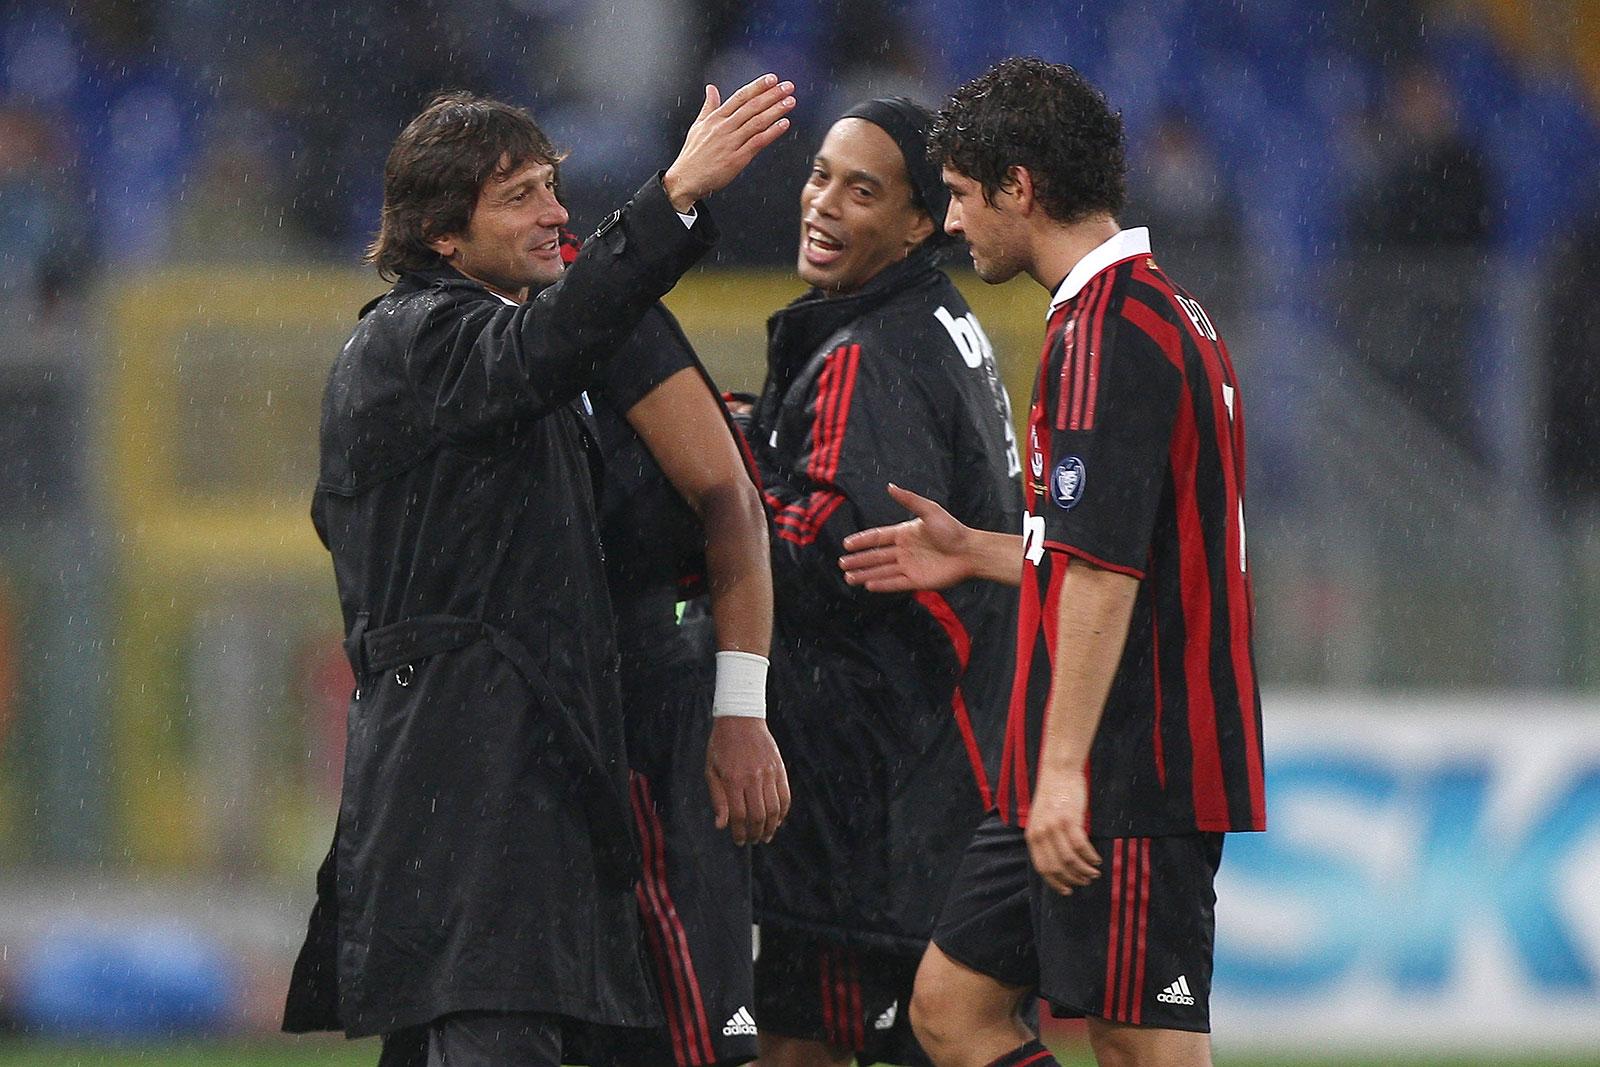 Leonardo, Pato and Ronaldinho celebrating at the end ofLazio-Milan at Stadio Olimpico on November 8, 2009. (Photo by Paolo Bruno/Getty Images)